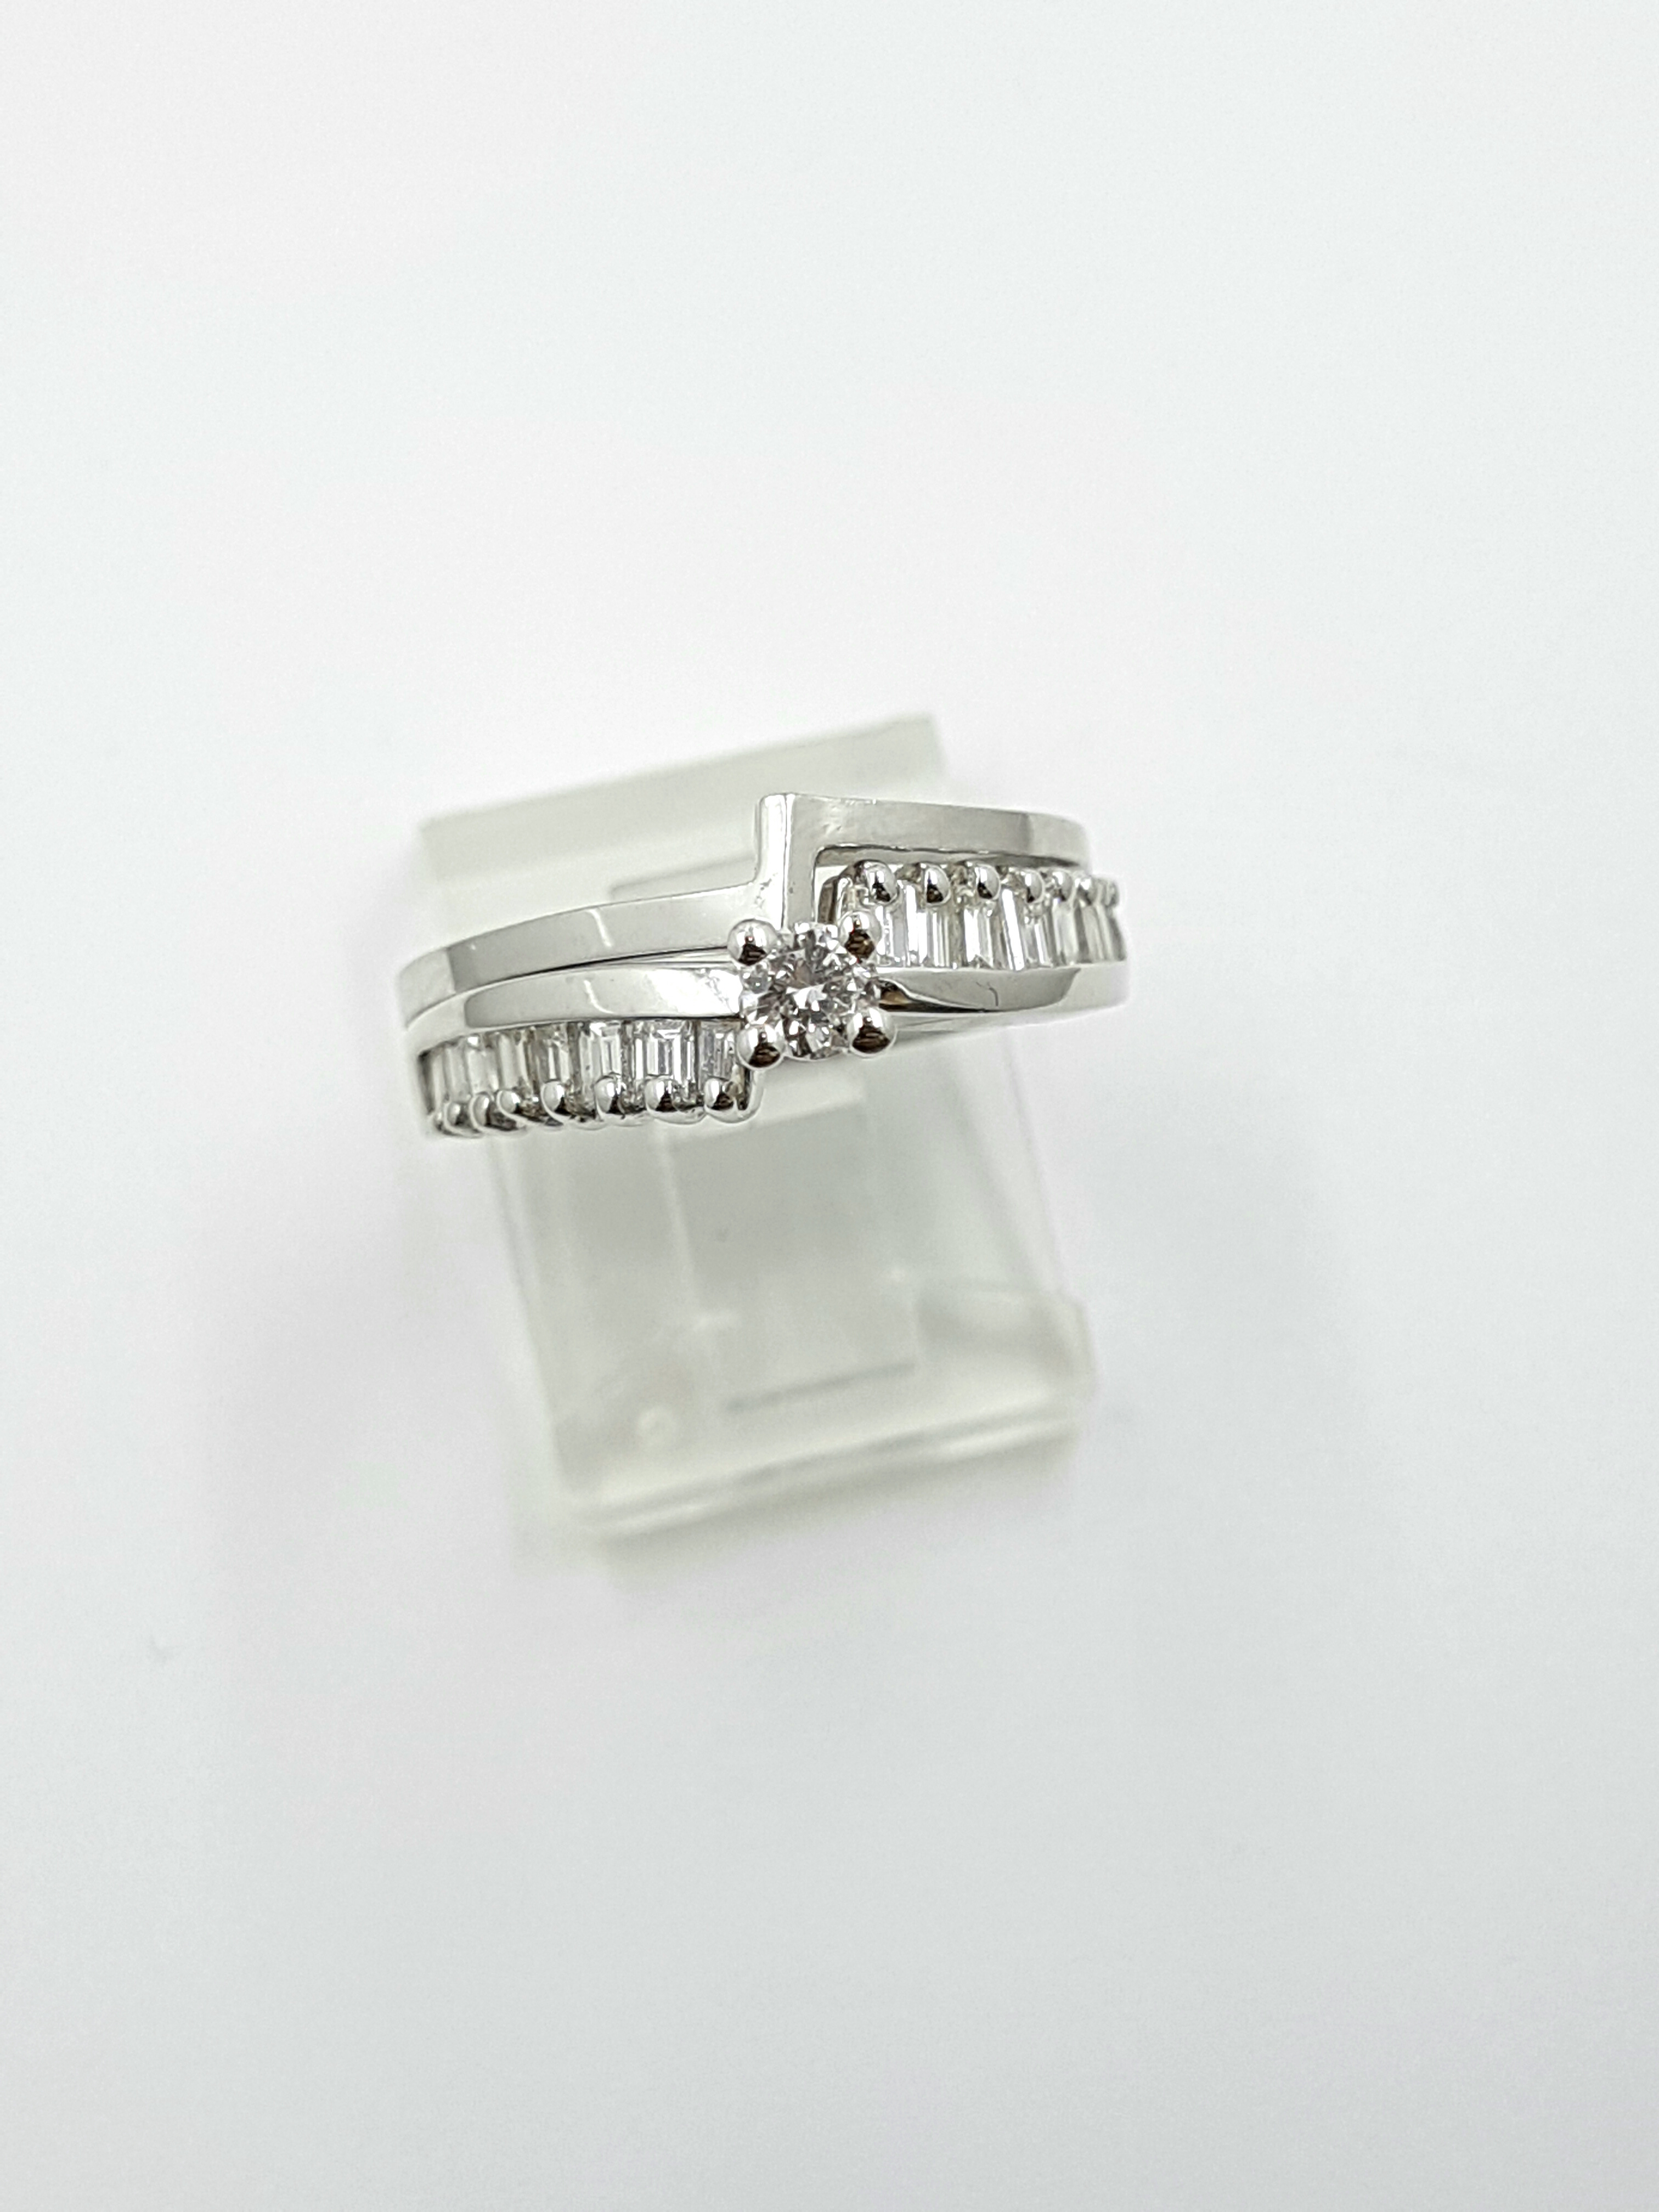 Engagement Ring & Wedding Band 14K White Gold 0.65ct Total Regular Price $4775 SALE $1150 Ref: DER119+W